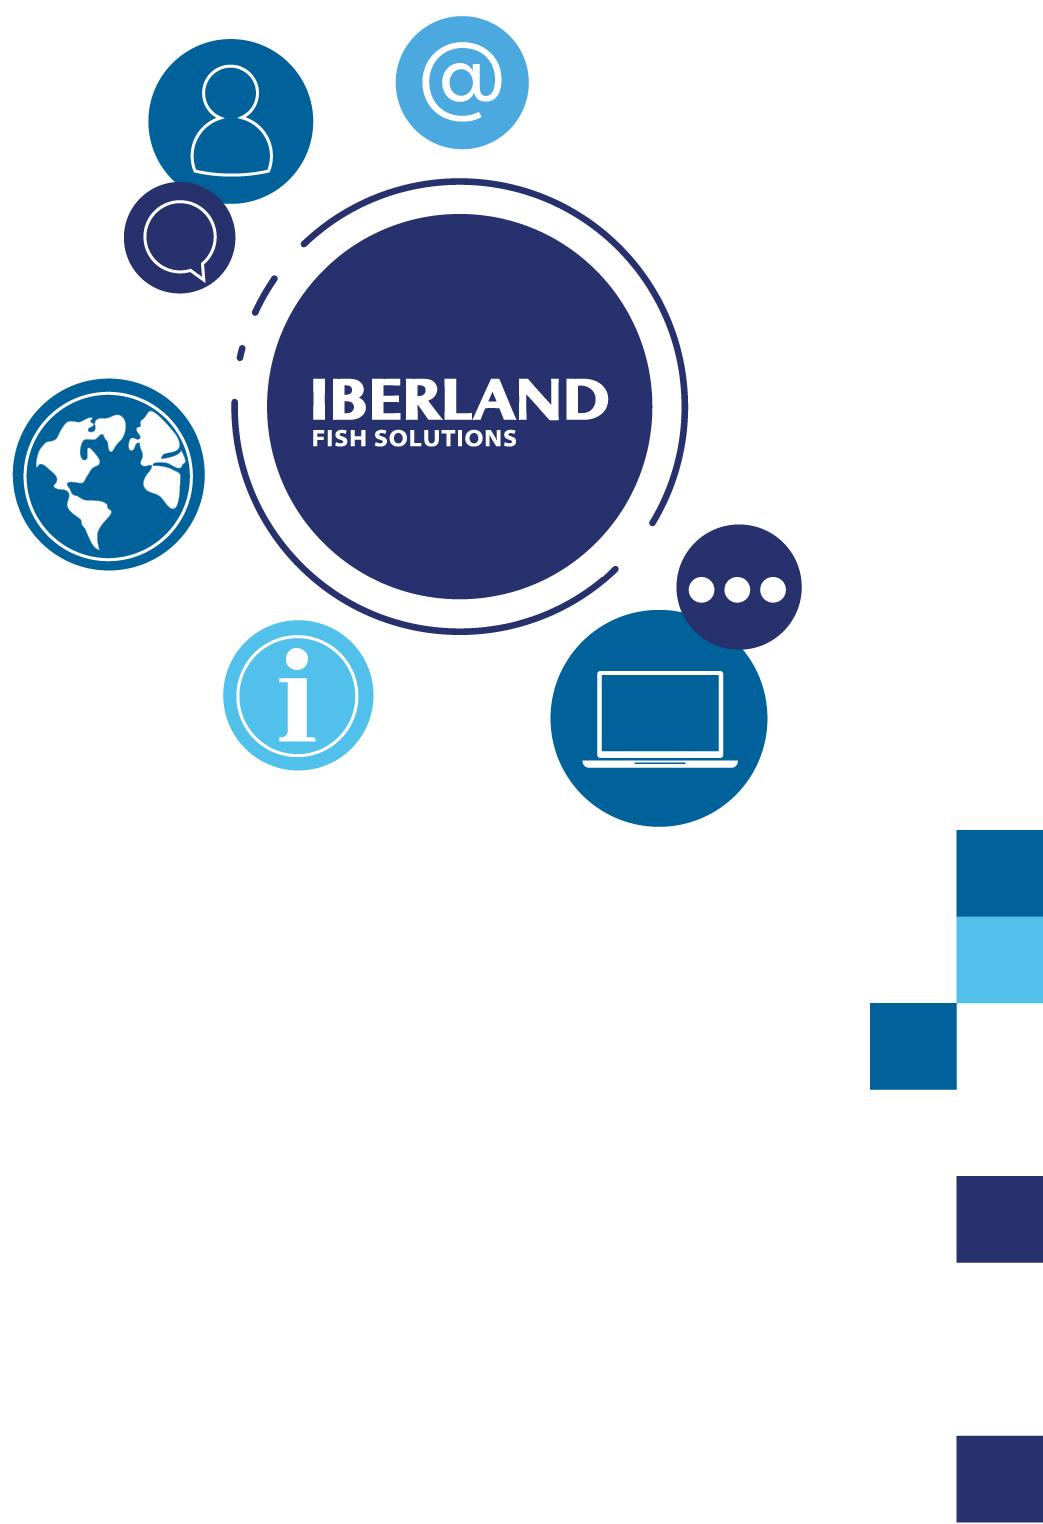 contacto de iberland